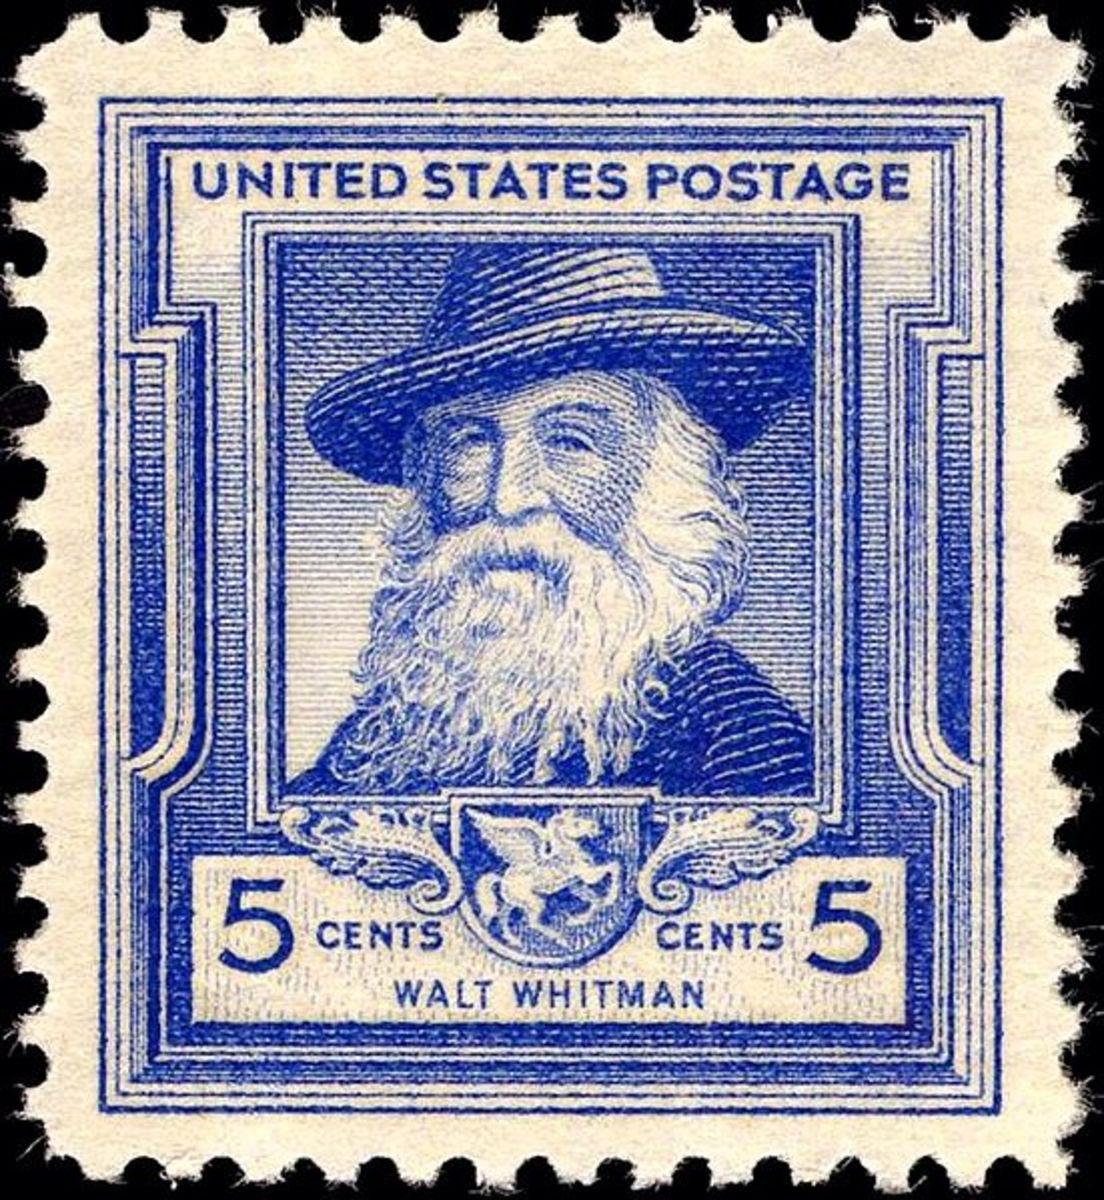 Walt Whitman - Commemorative Stamp